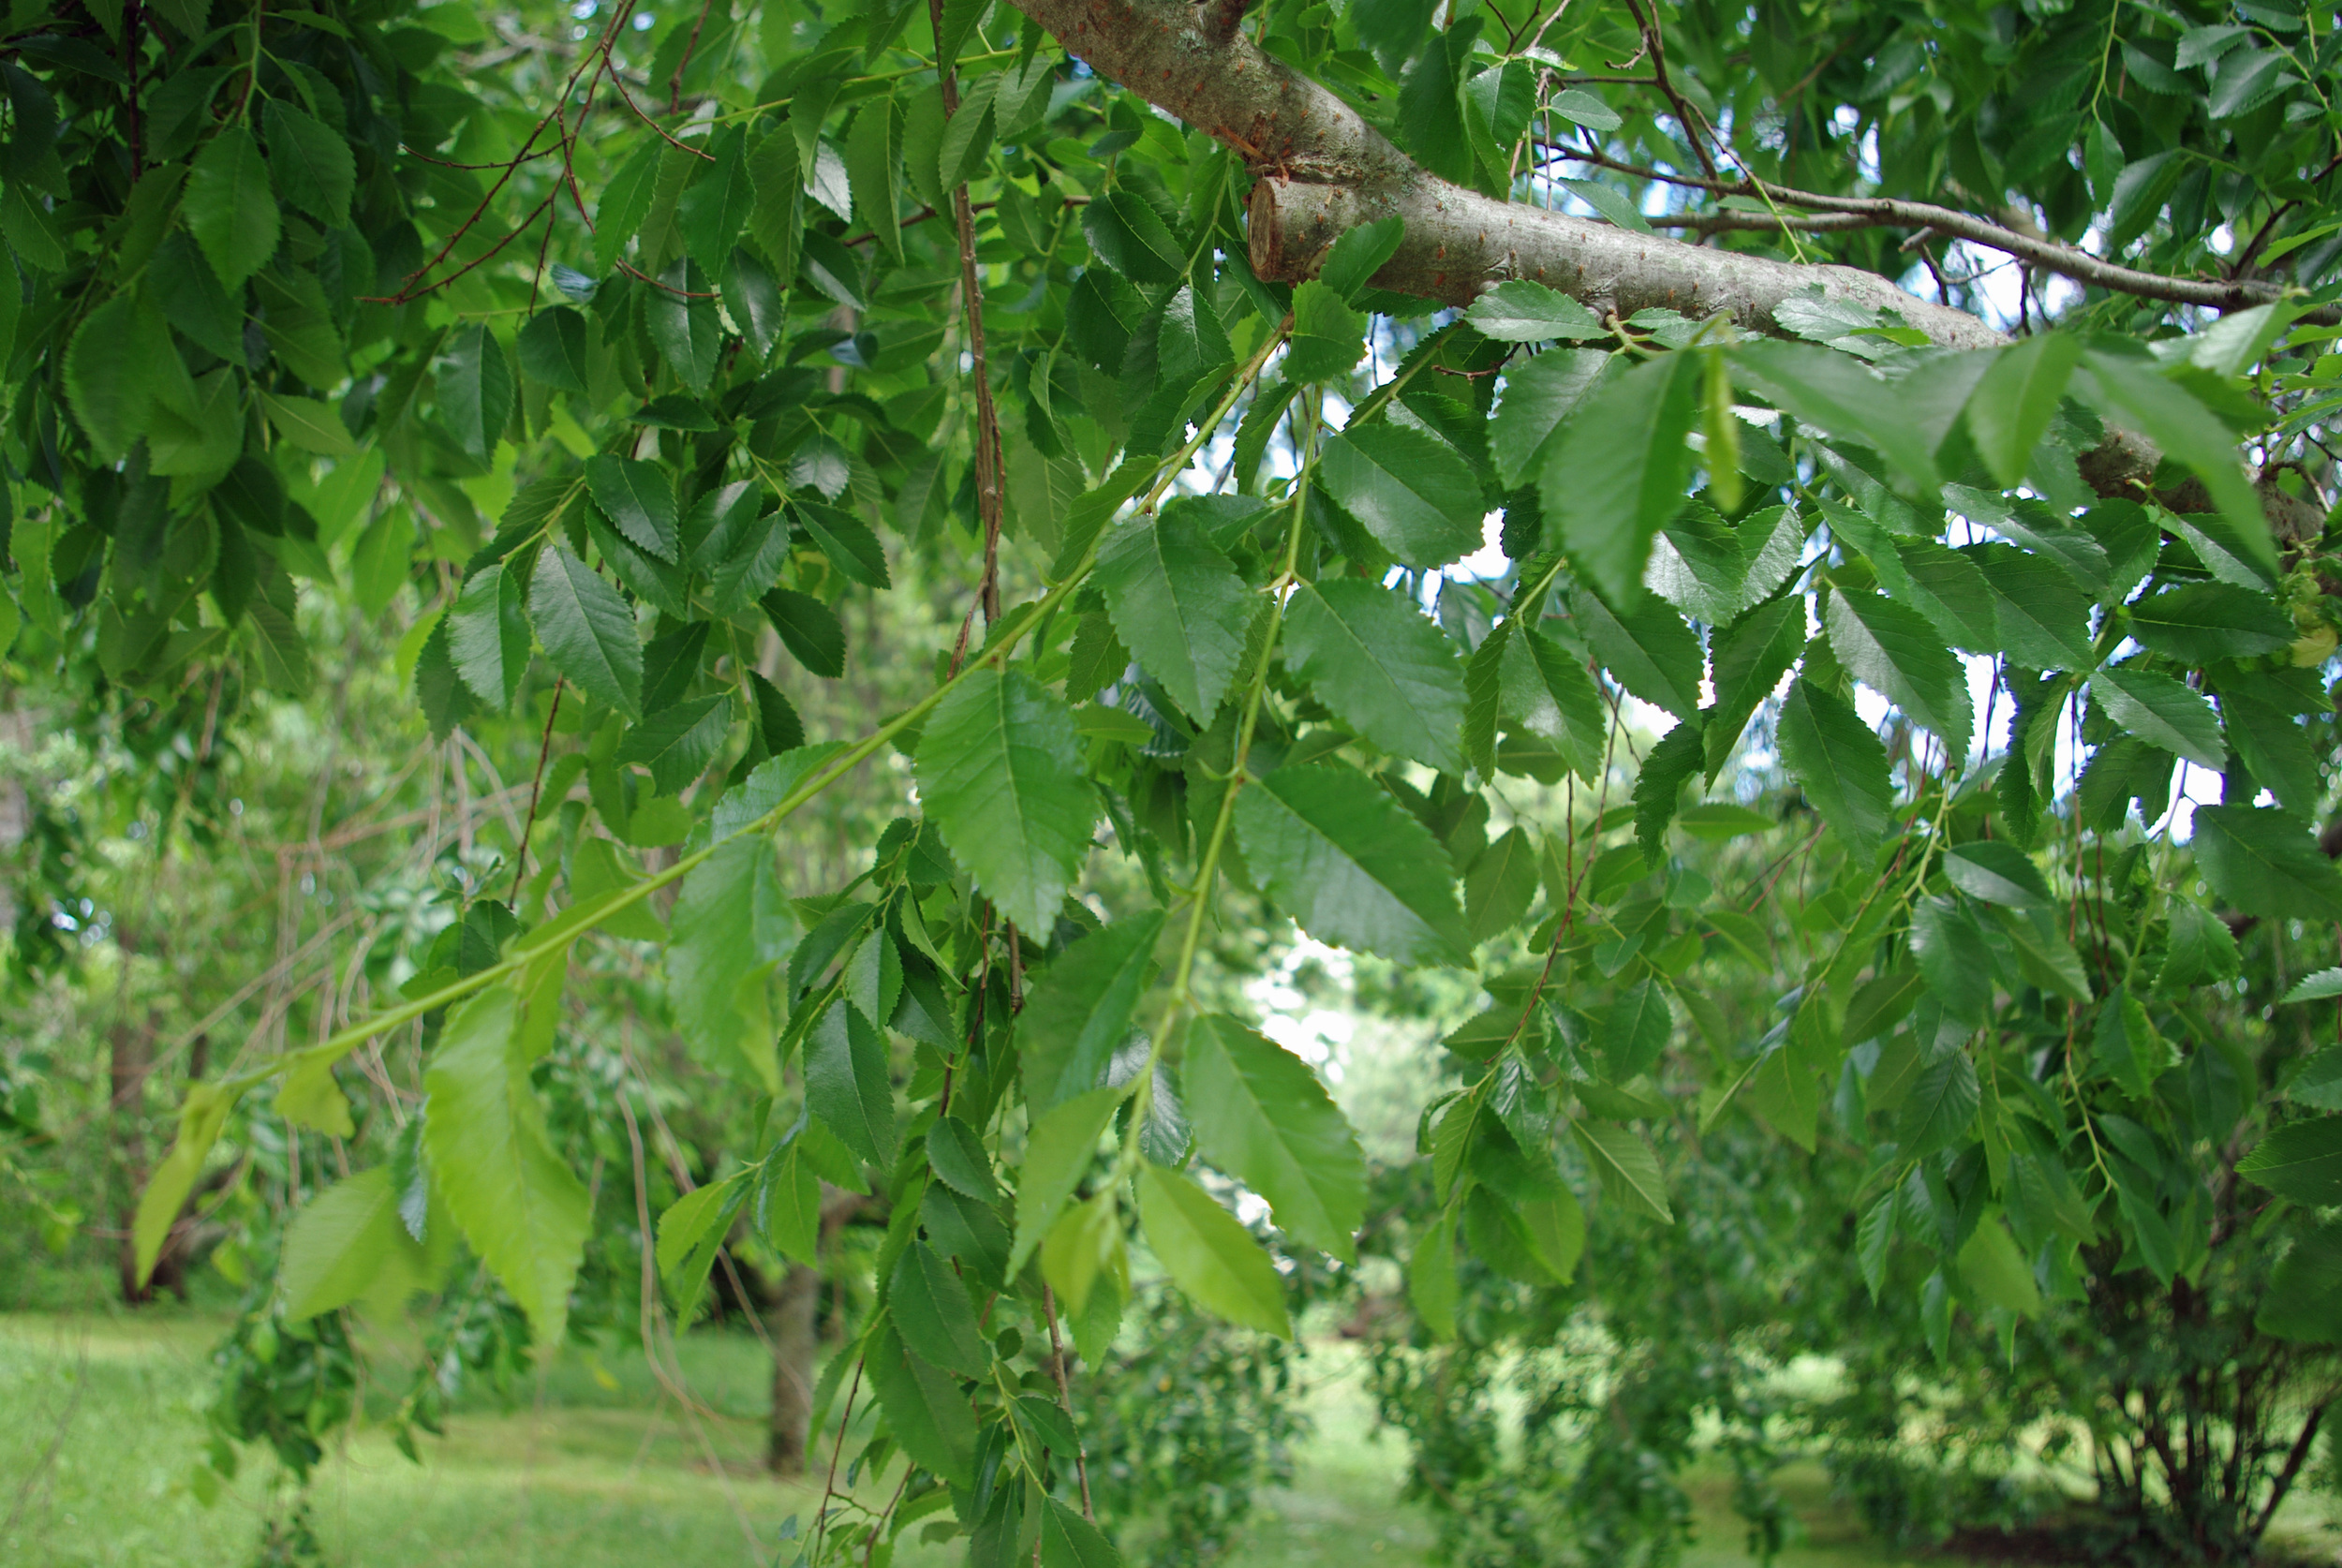 Ulmus_parvifolia_Kings_choice_foliage.jpg